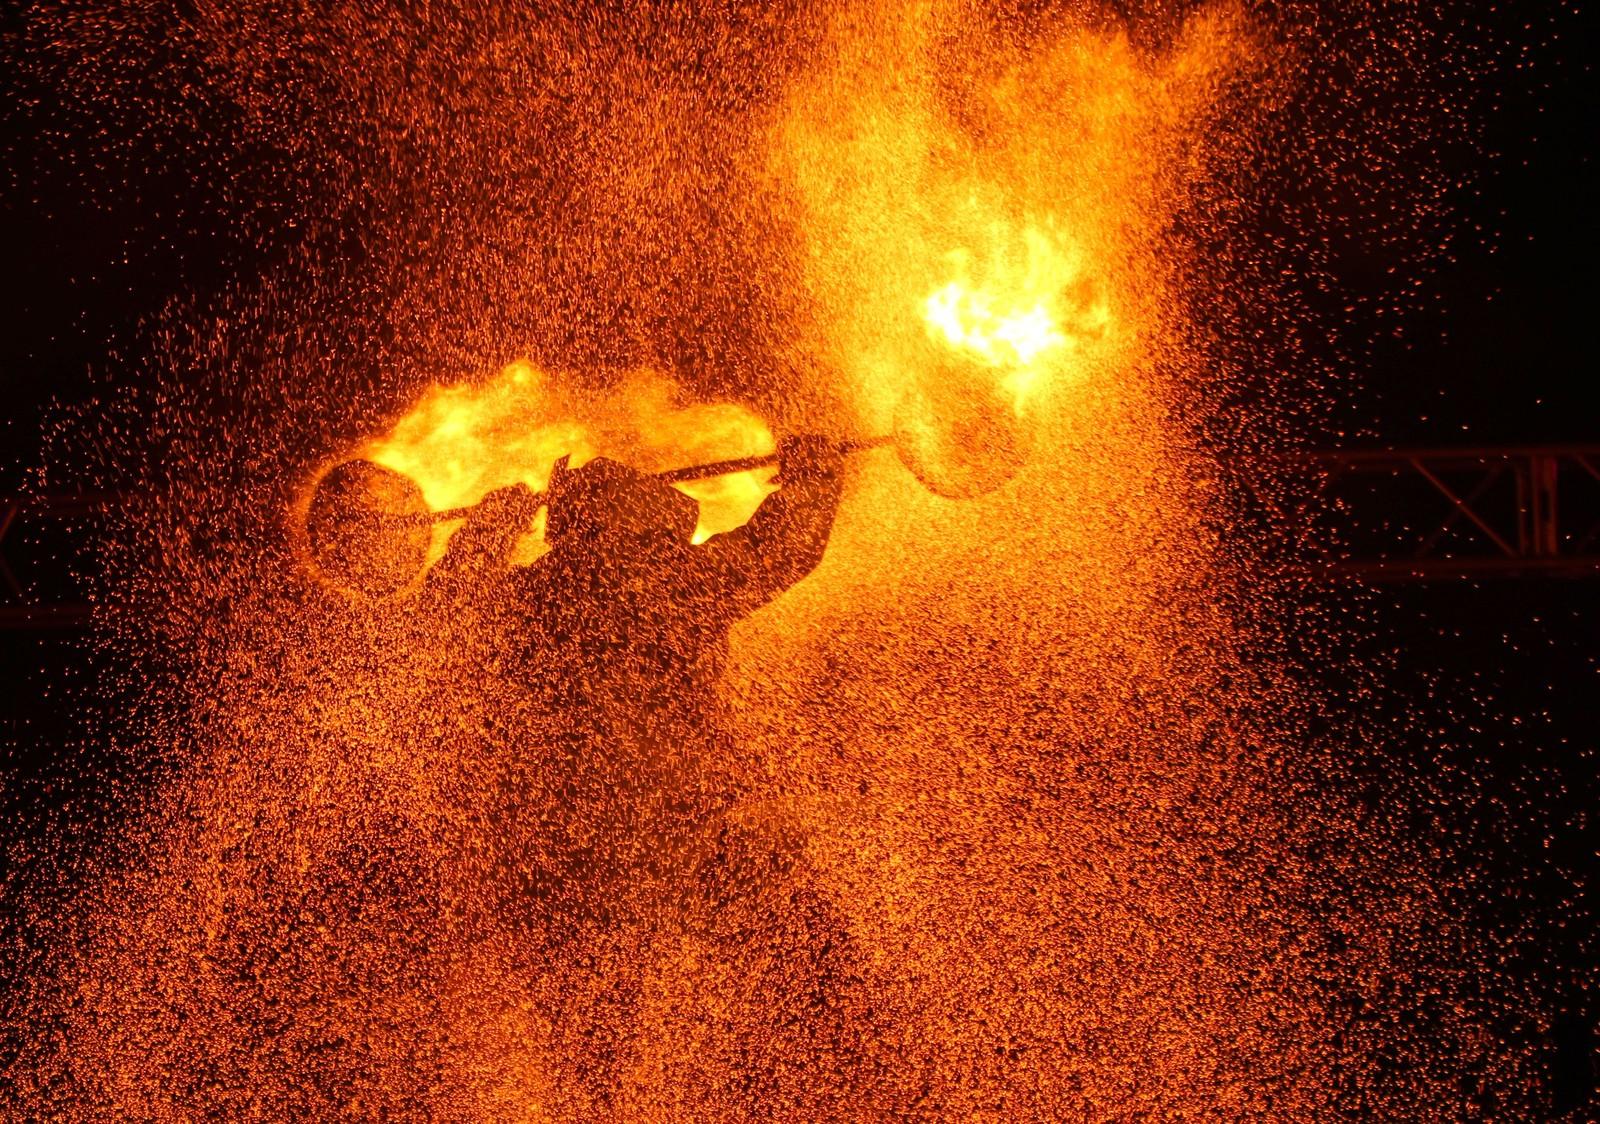 "En festival med flammer i fokus fant sted i Minsk, Hviterussland denne uka. Fotografens lange lukkertid fanget dette blinkskuddet under festivalen med navnet ""Miff-2015""."